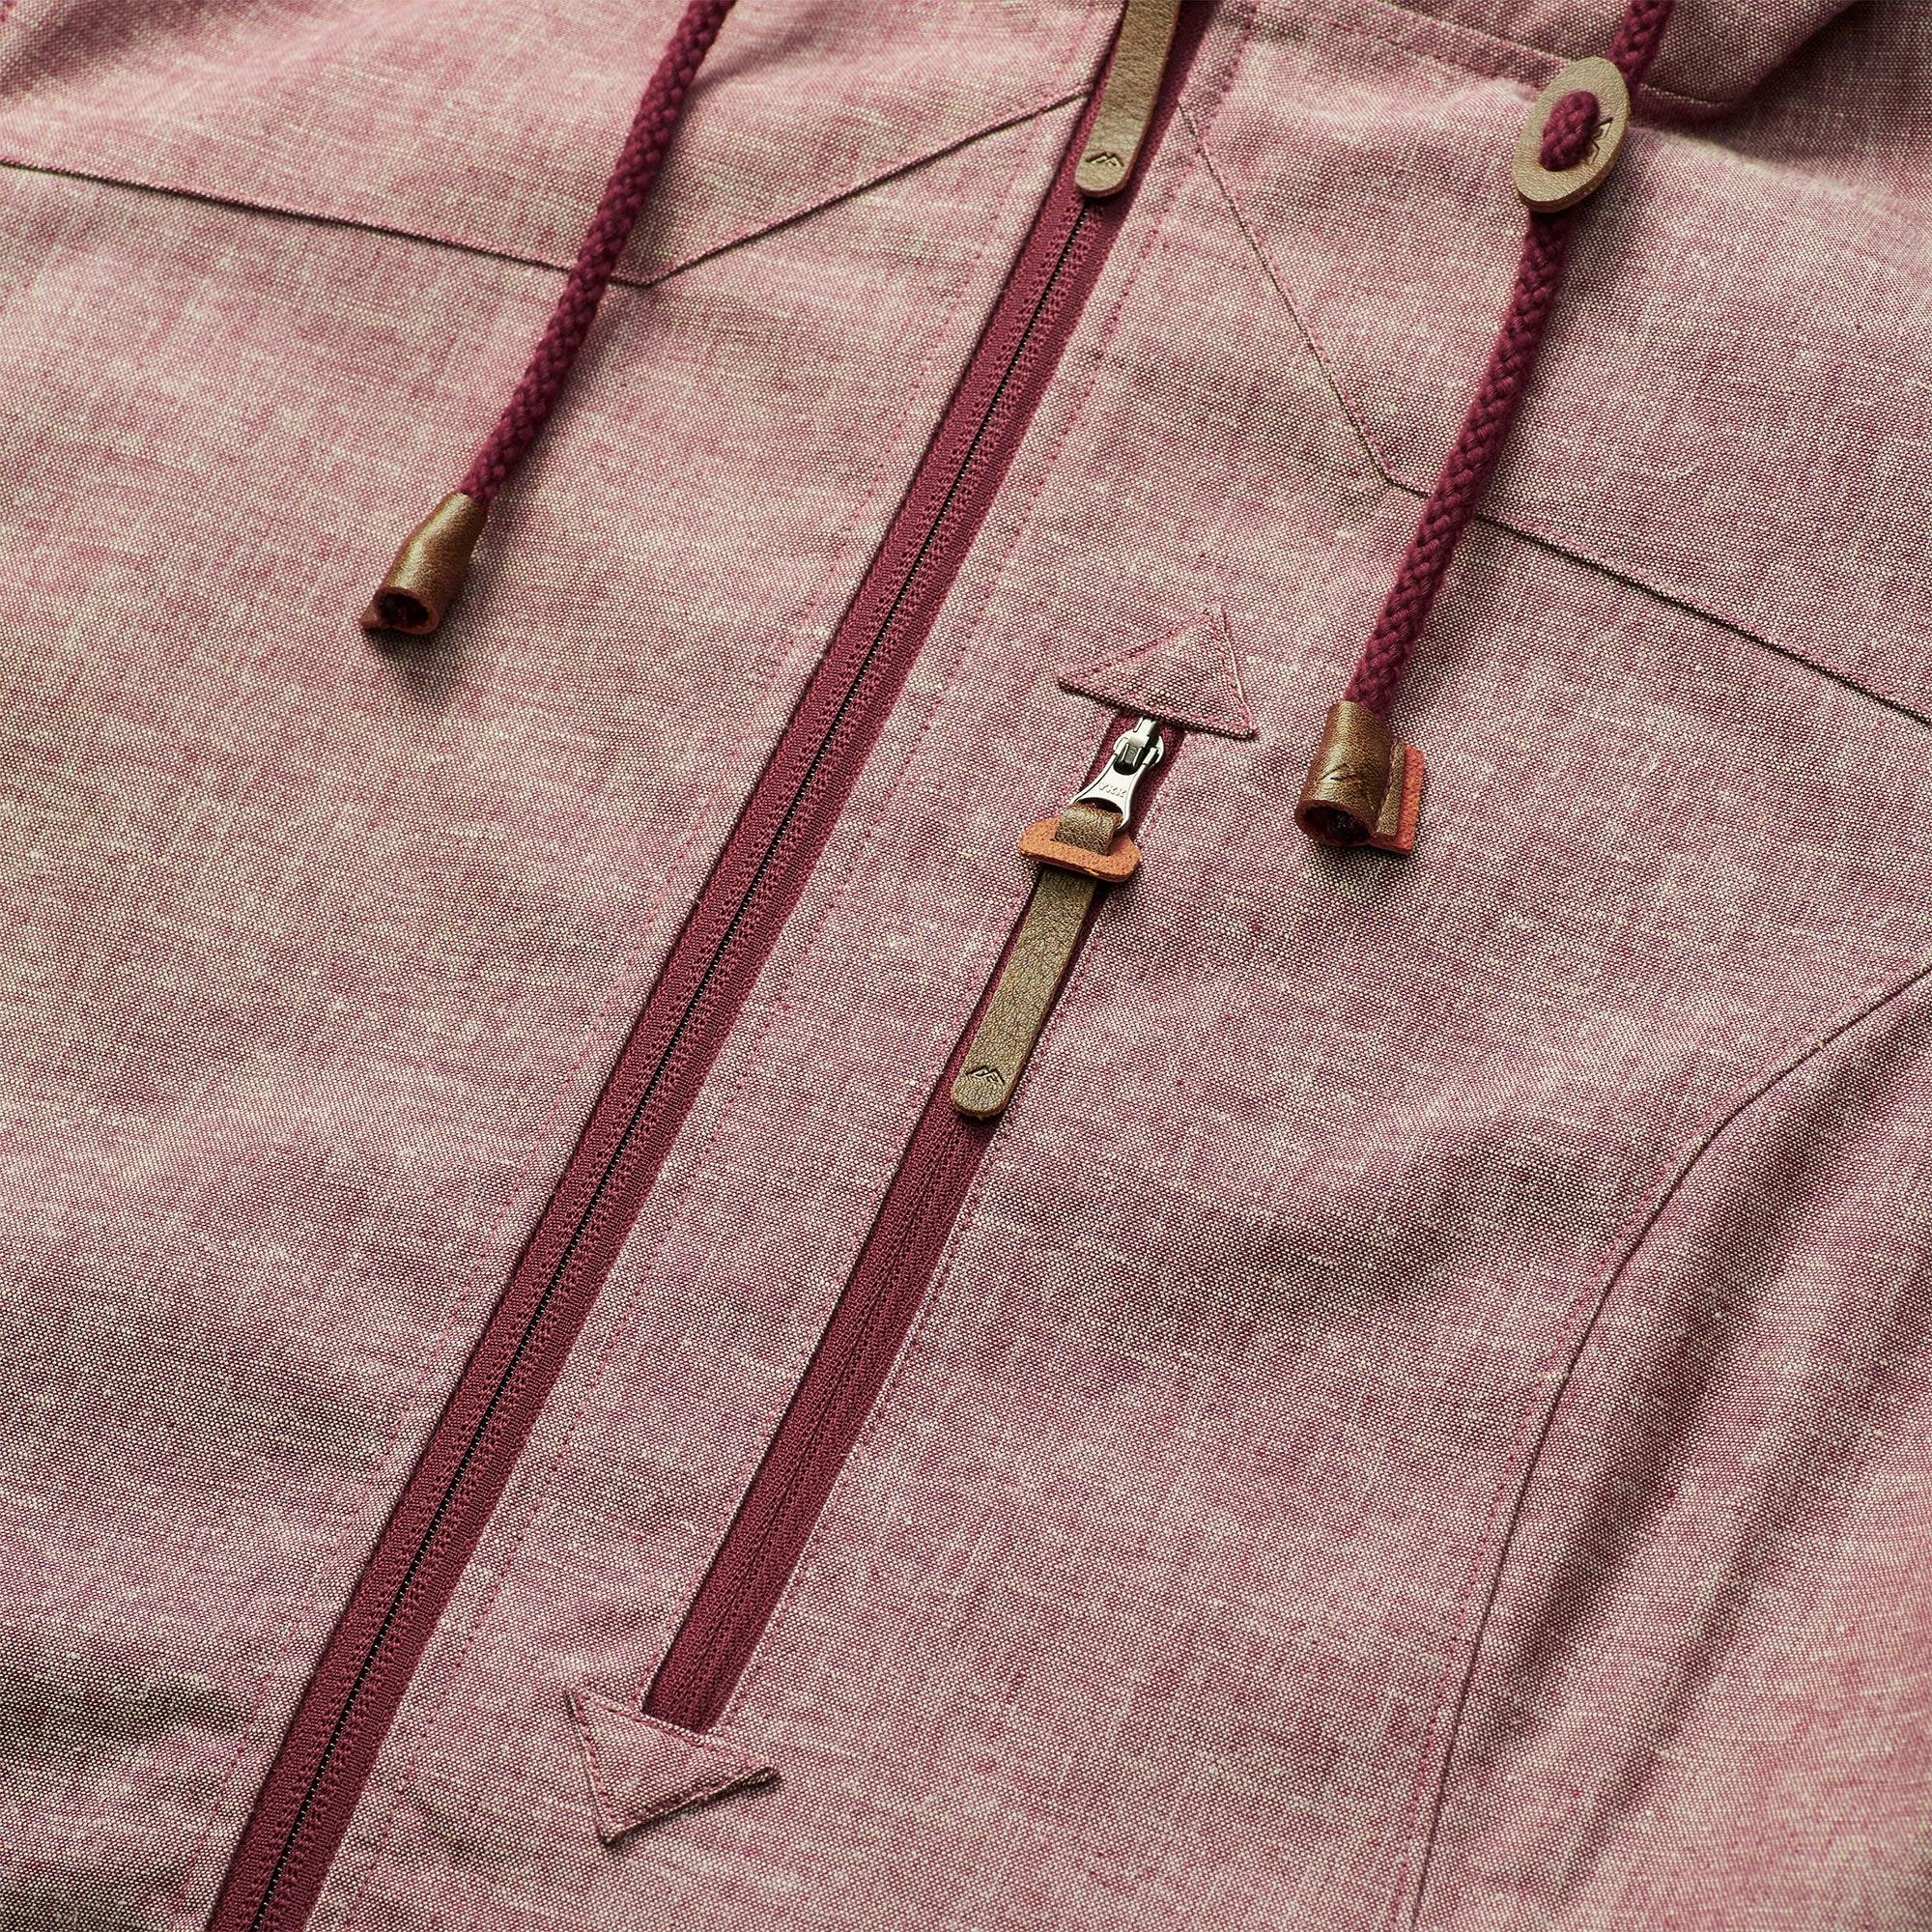 Kathmandu-Federate-Women-039-s-Urban-Travel-Windproof-Utility-Jacket